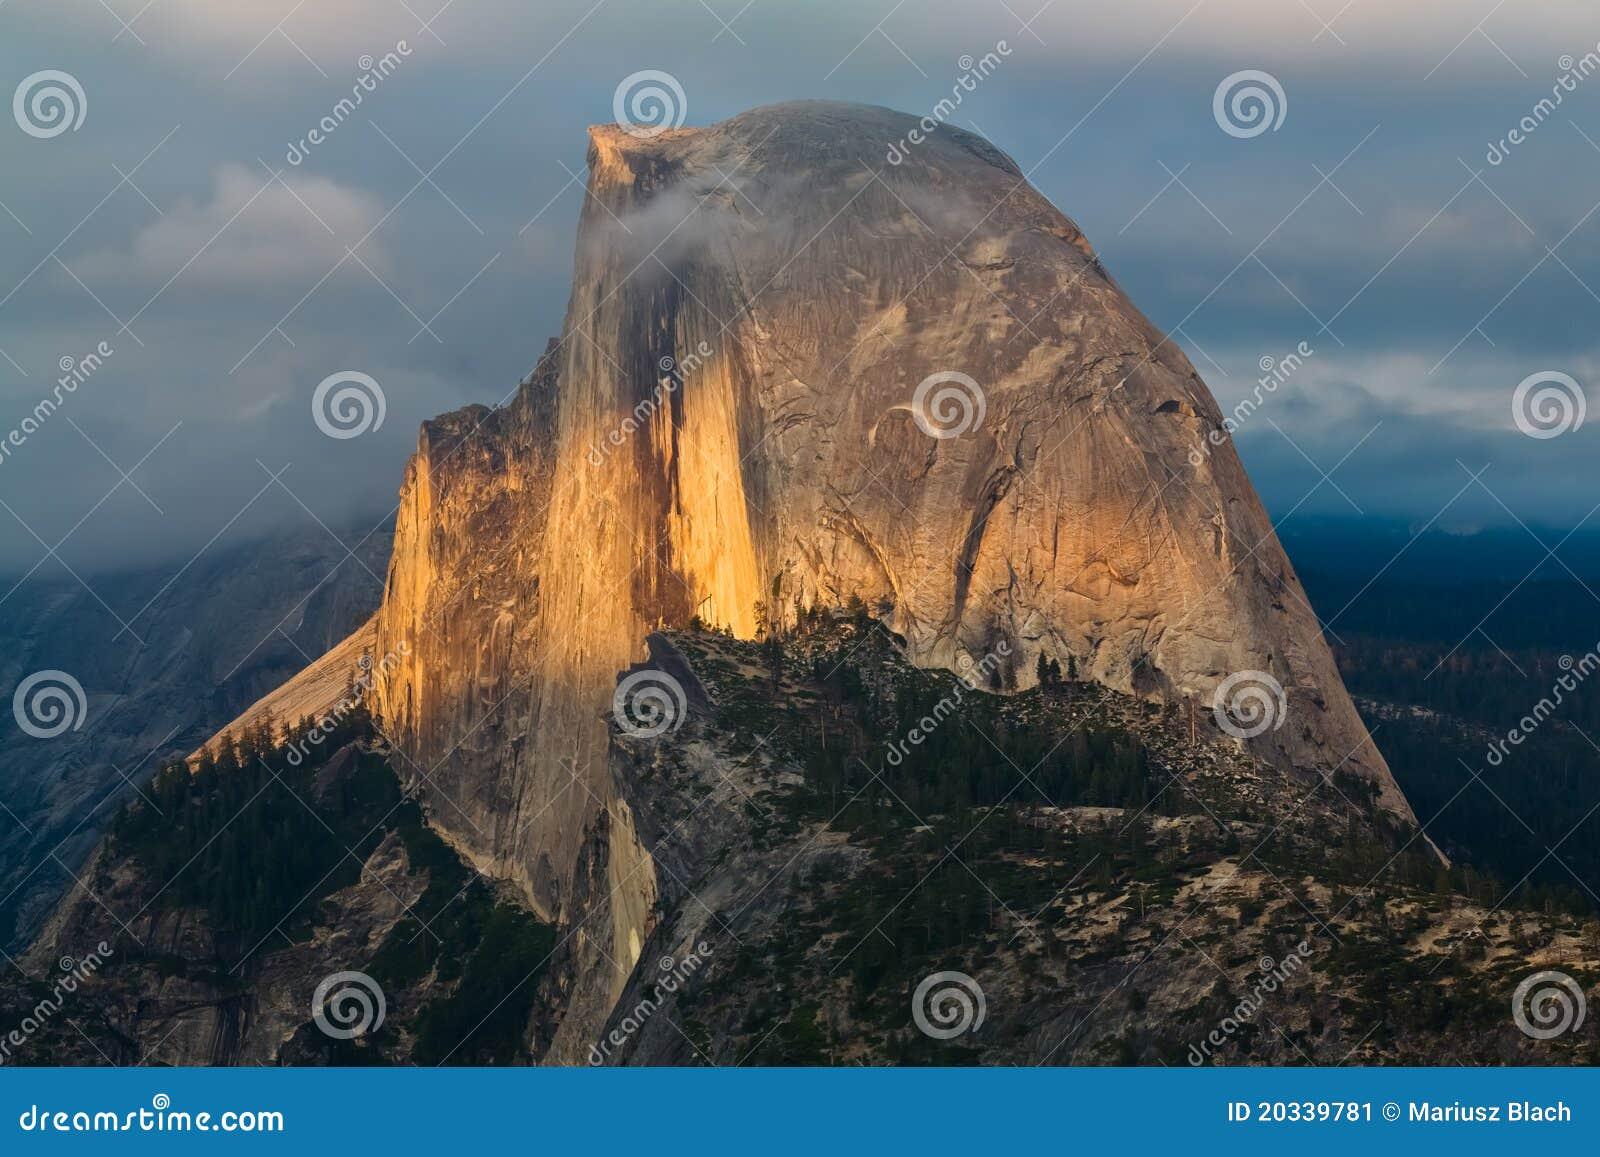 Download Half Dome stock image. Image of yosemite, halfdome, dome - 20339781